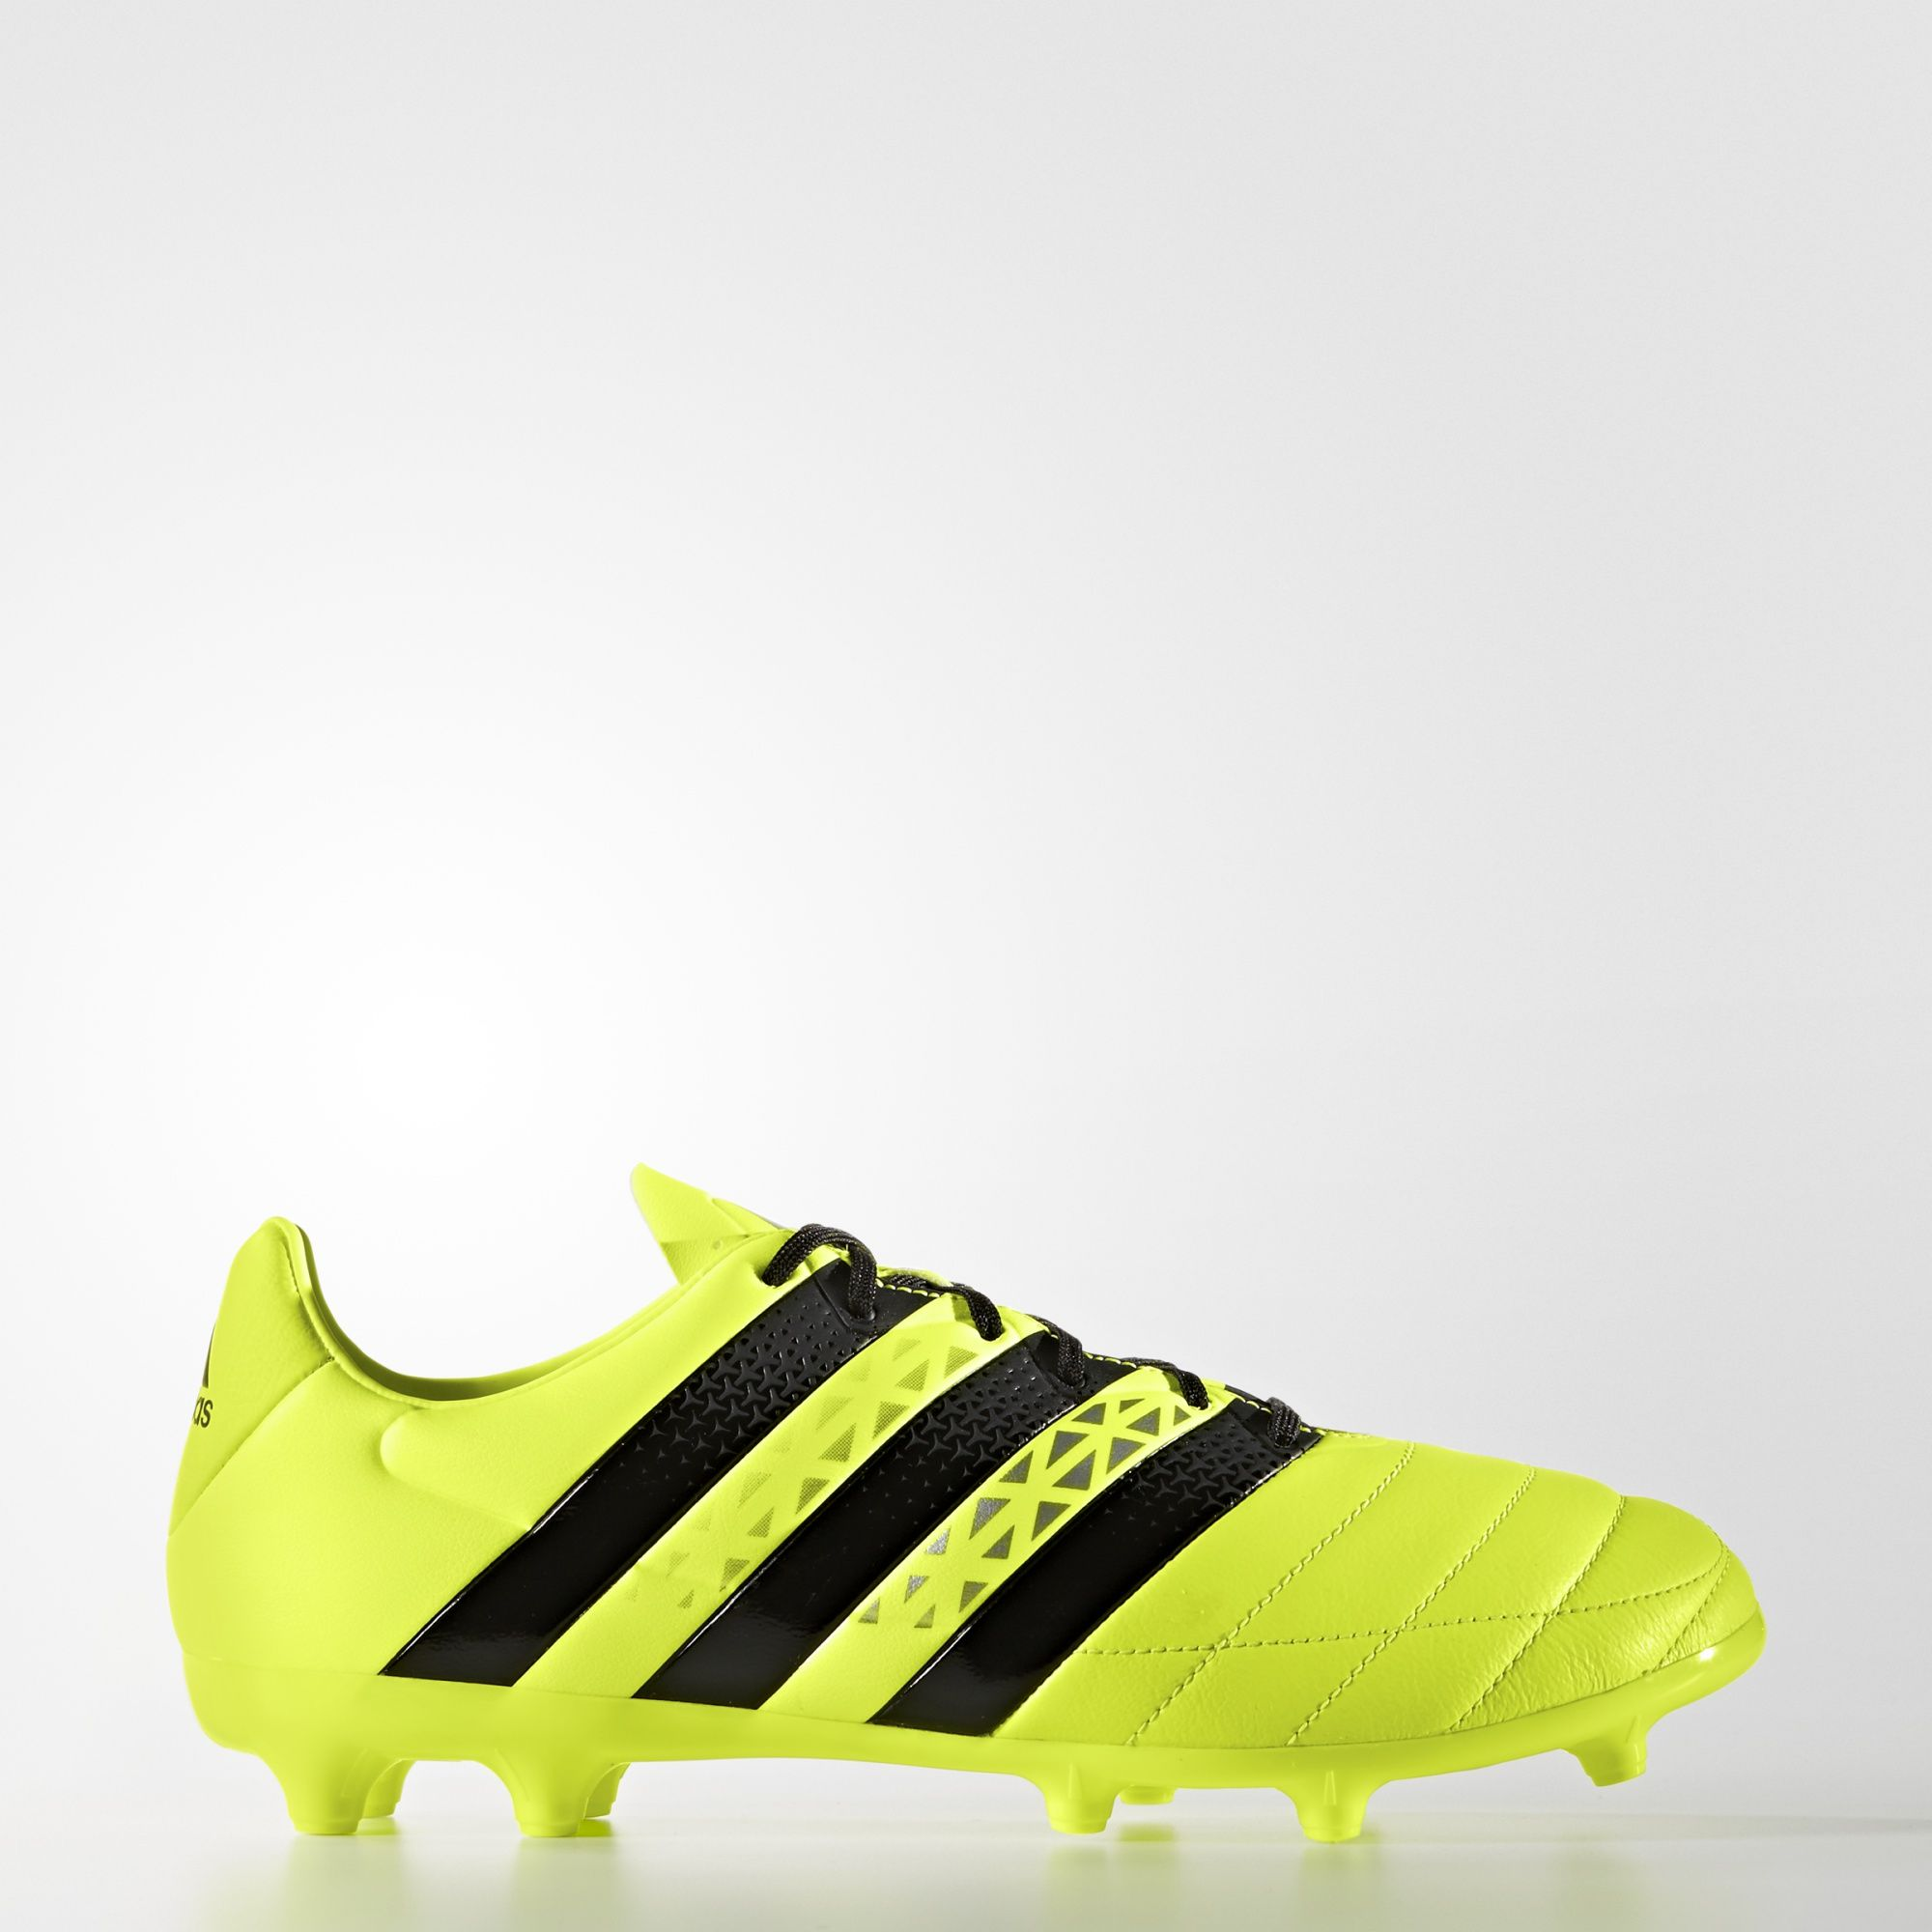 Adidas Ace 16.3 Leather